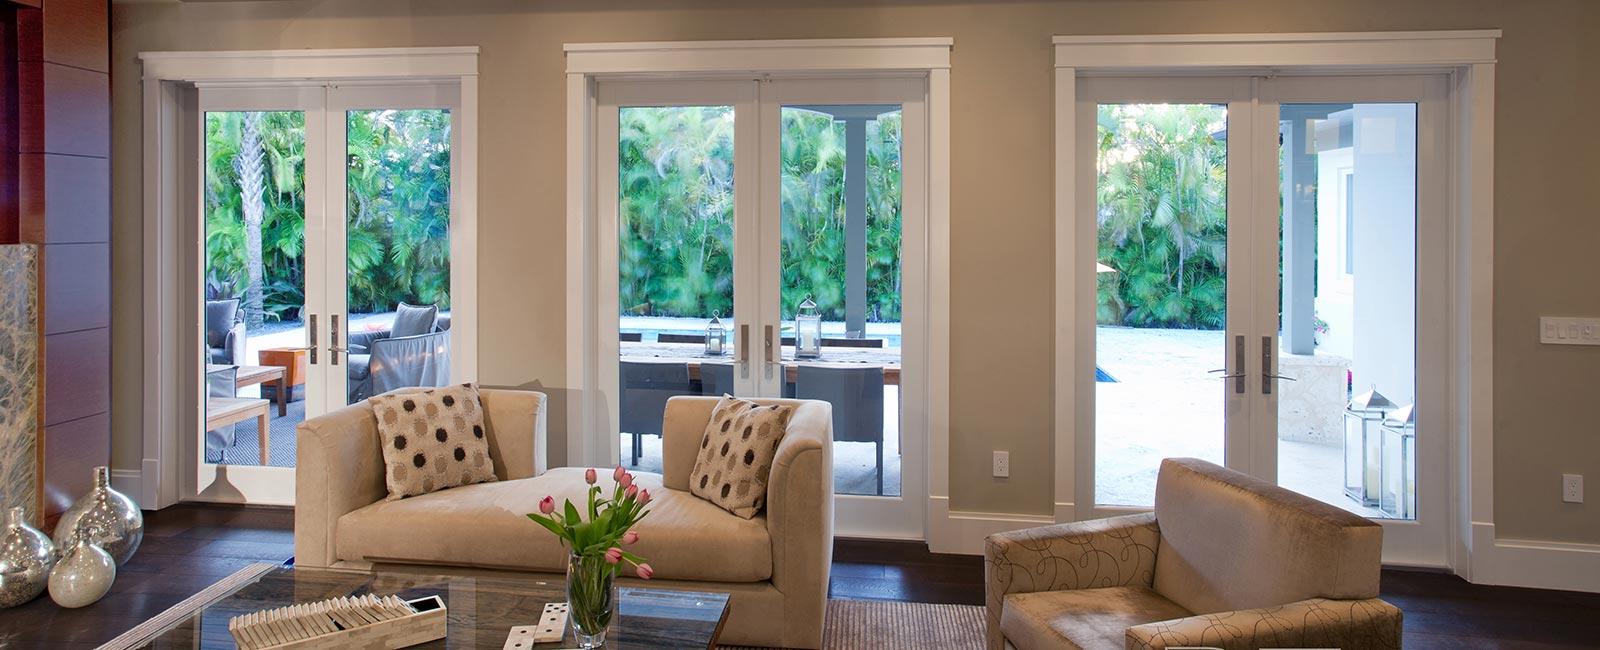 Newman Windows & Doors - San Diego Installation